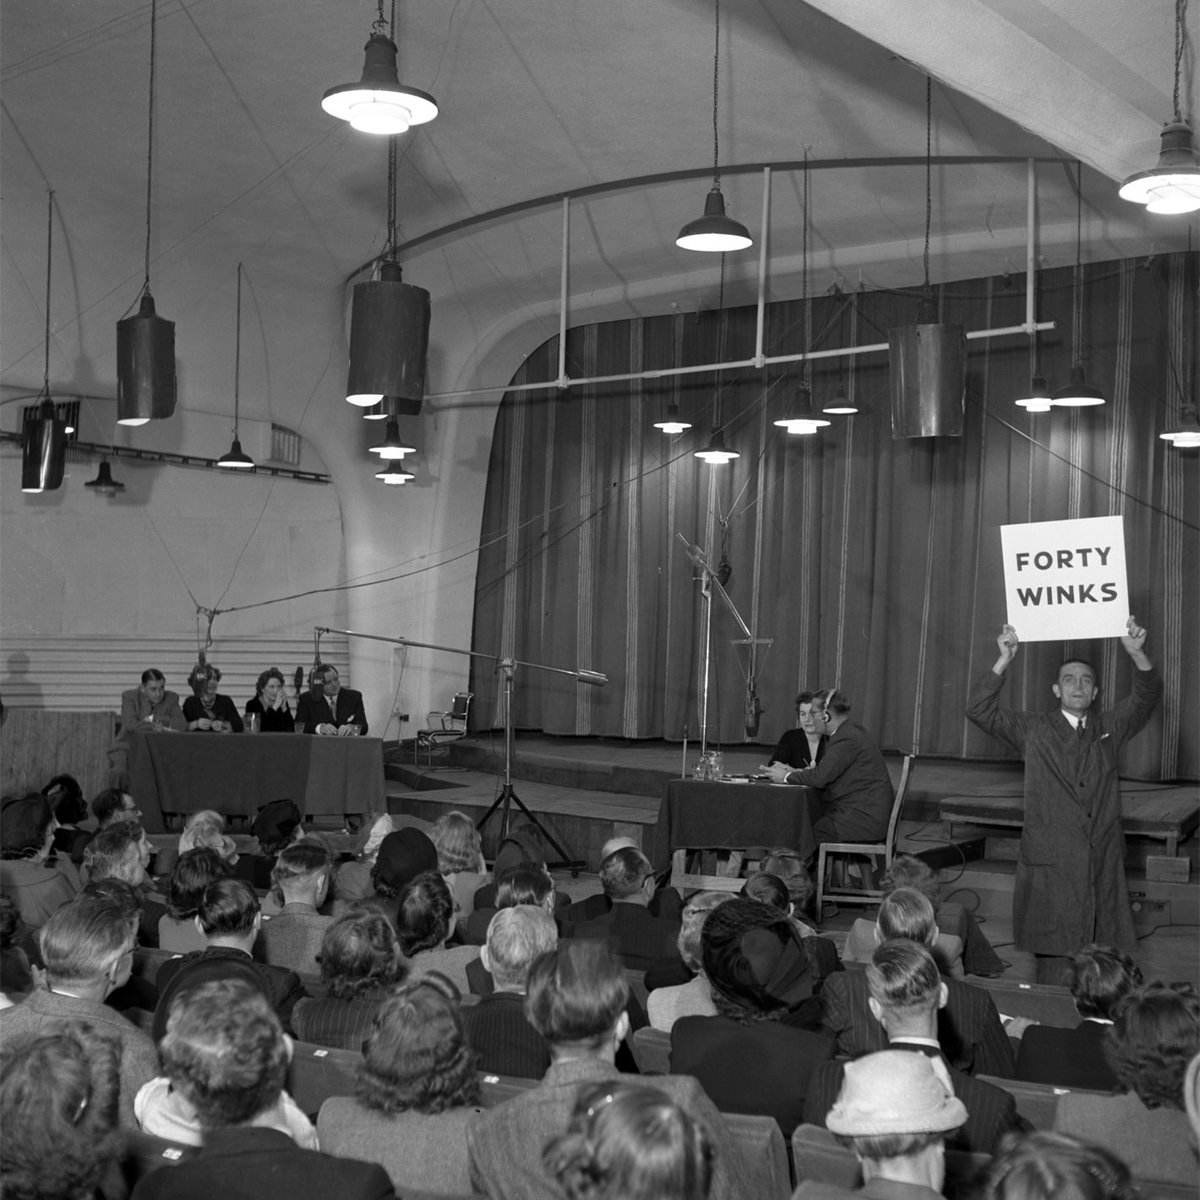 otd 1947: twenty questions was first broadcast on bbc radio